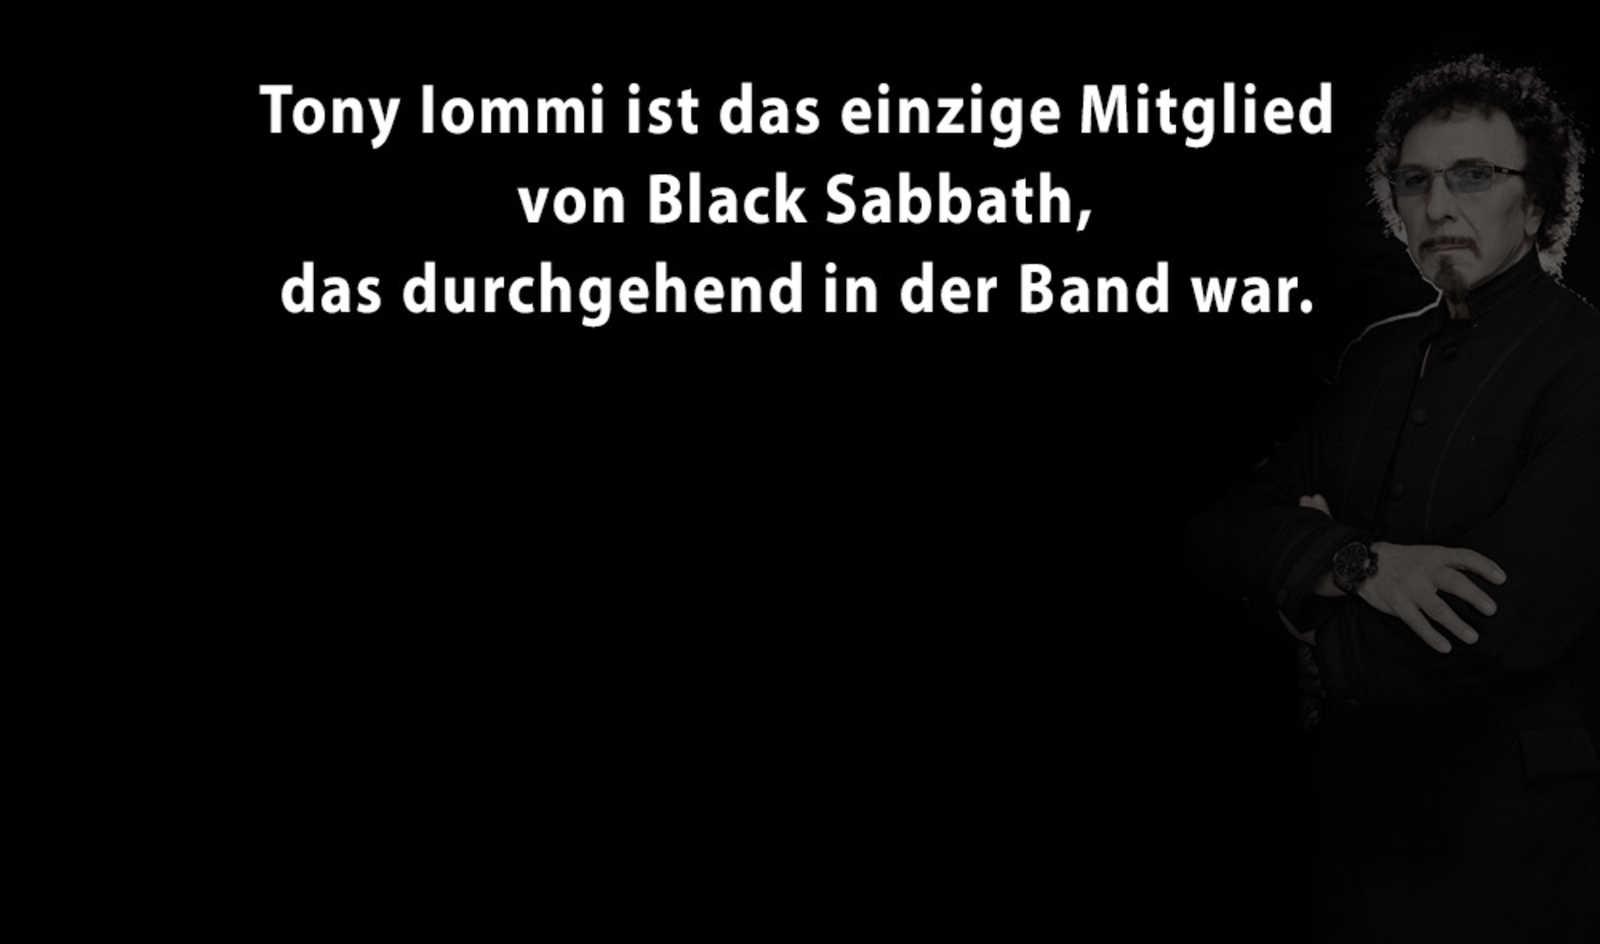 5 Facts über Tony Iommi